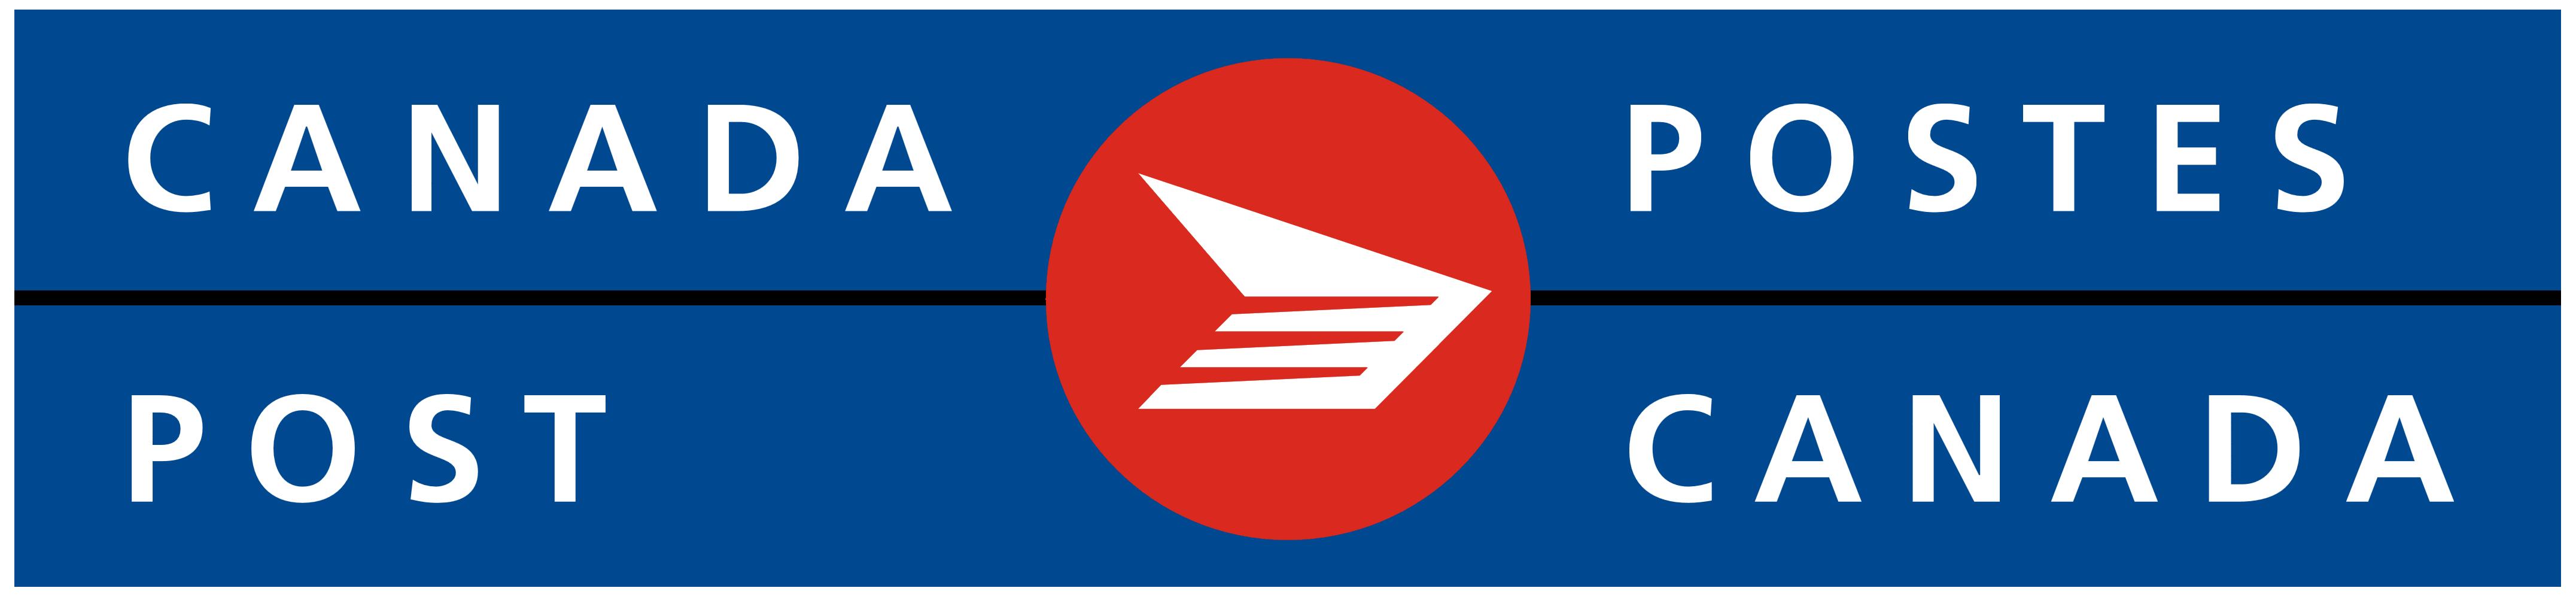 Canada Post.